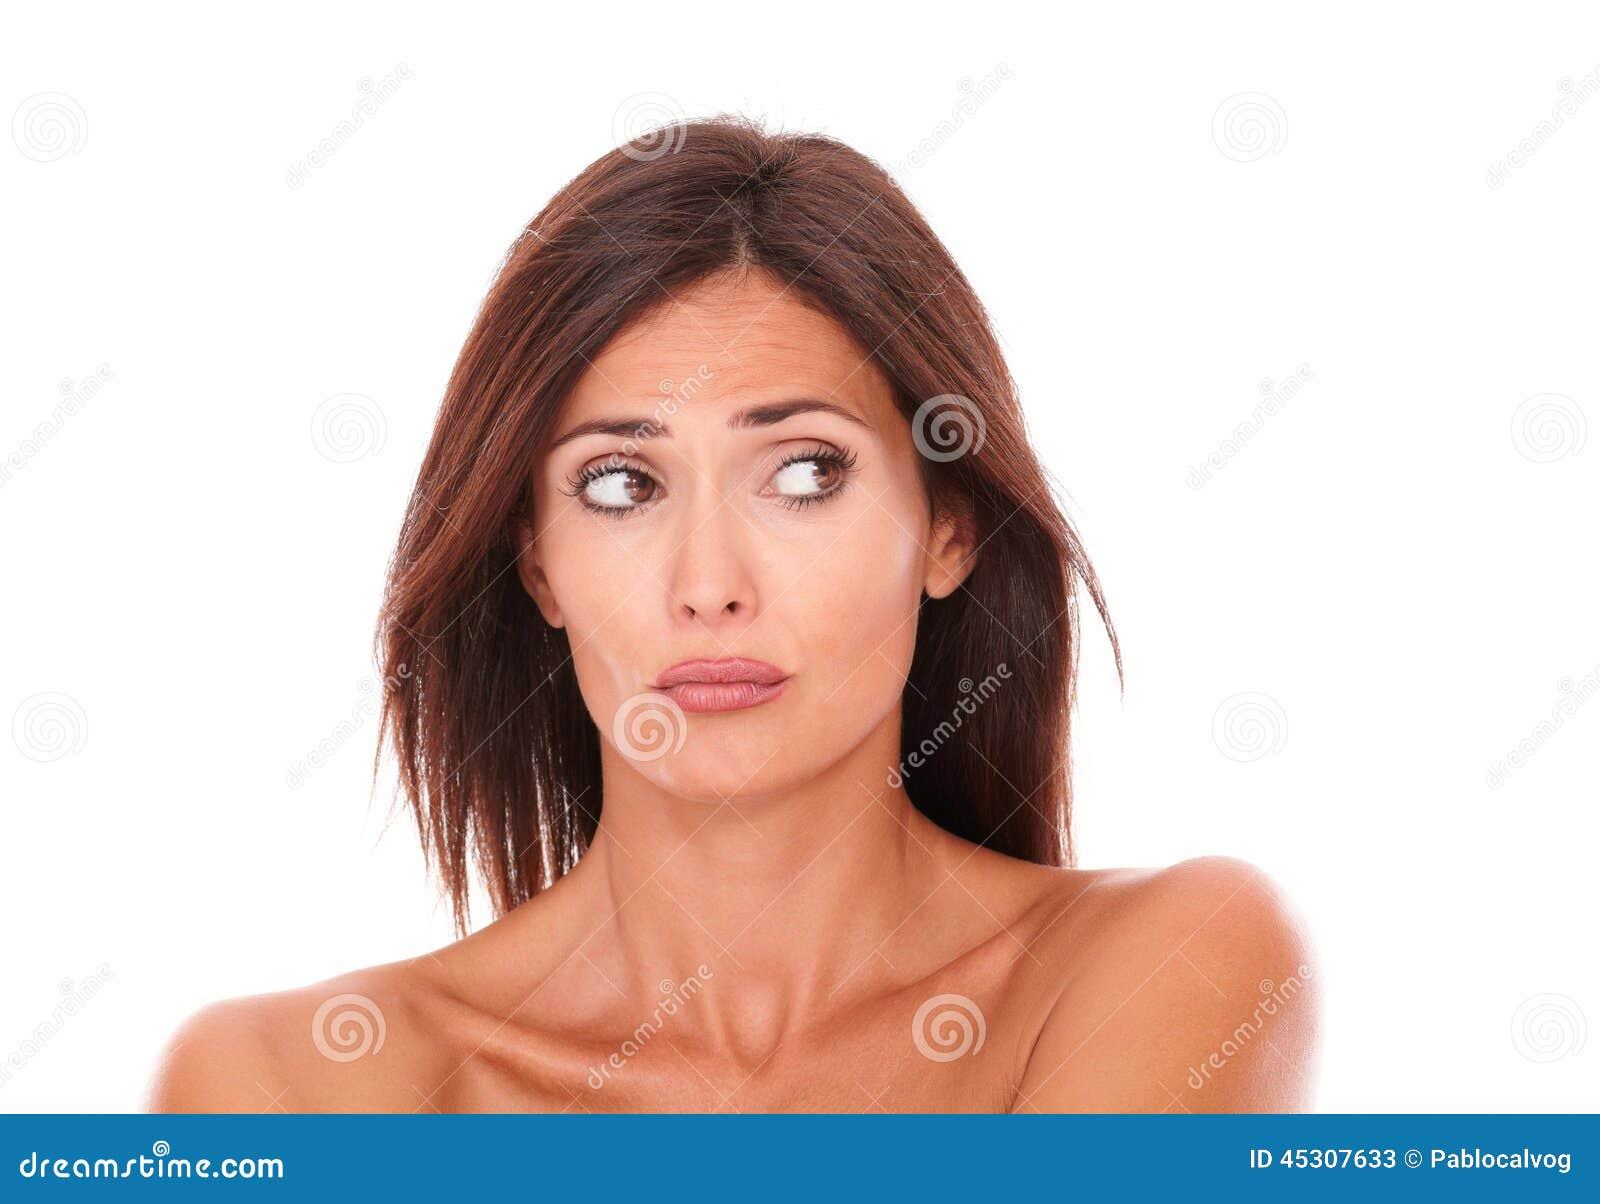 Nude women group photos